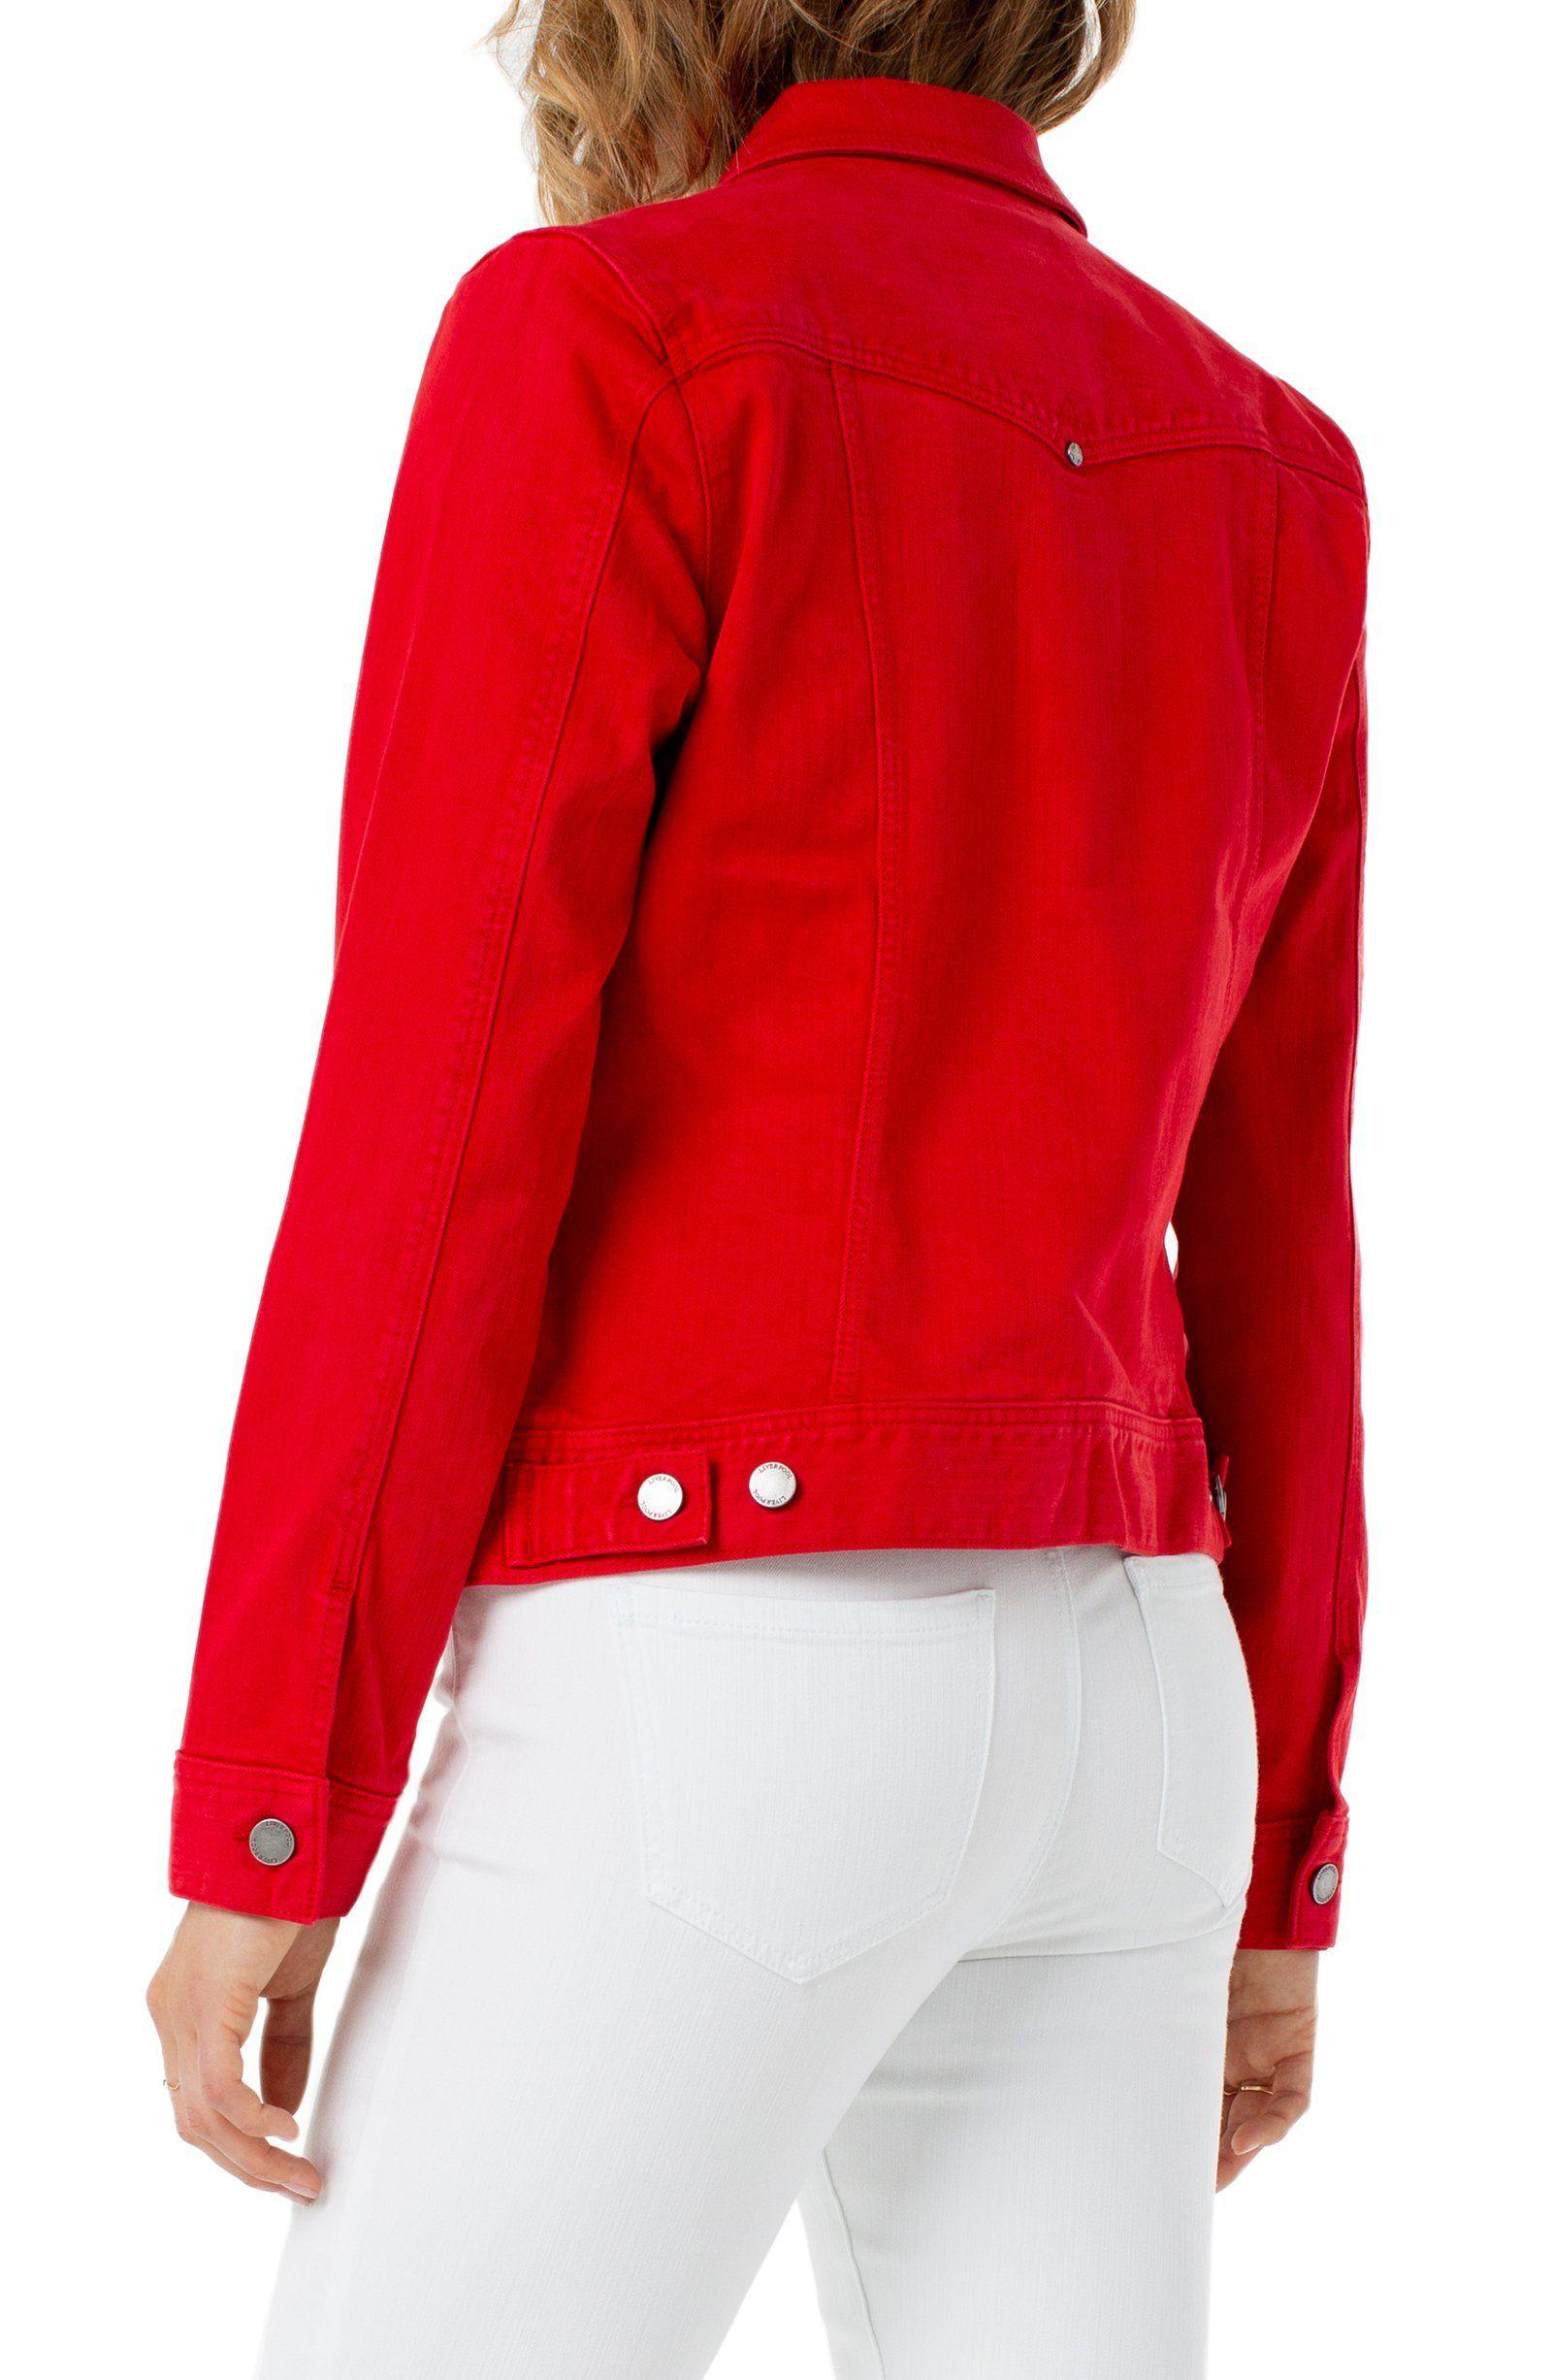 Liverpool Womens Classic Jean Jacket High Performance Denim